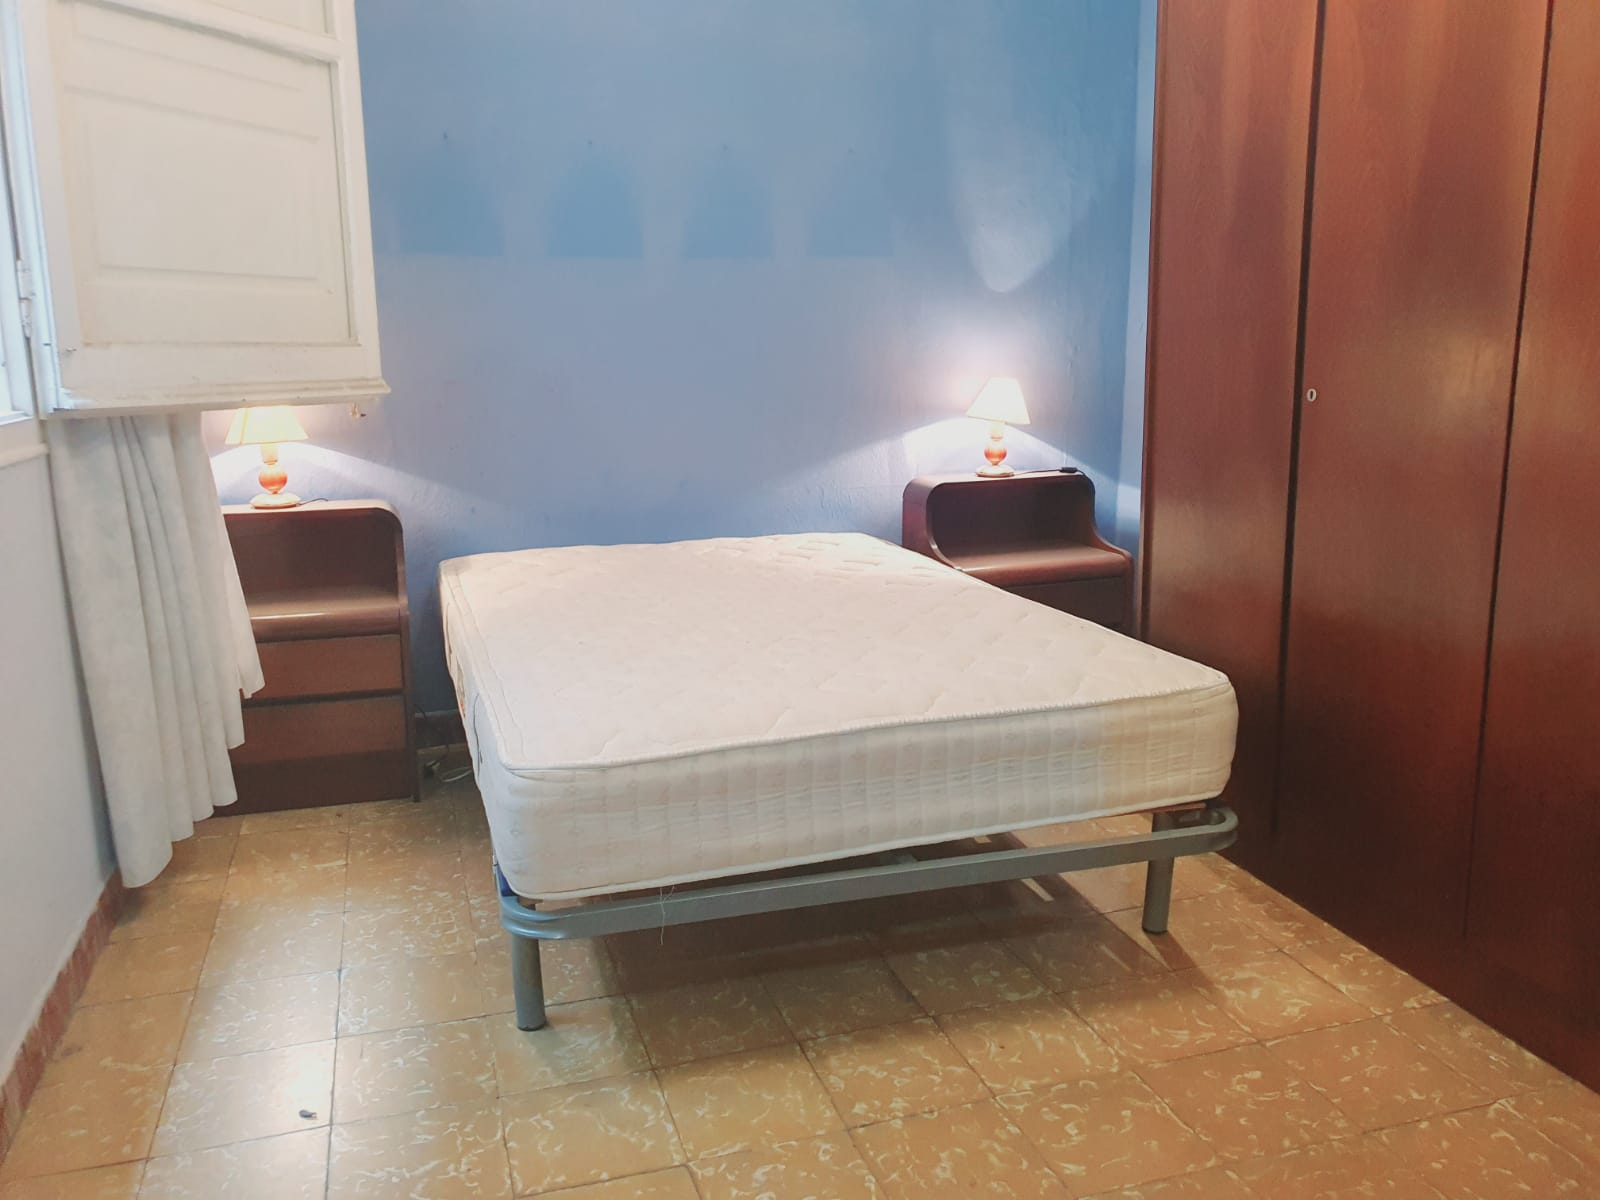 Piso en La florida en L'Hospitalet de llobregat en Venta por 96.000€